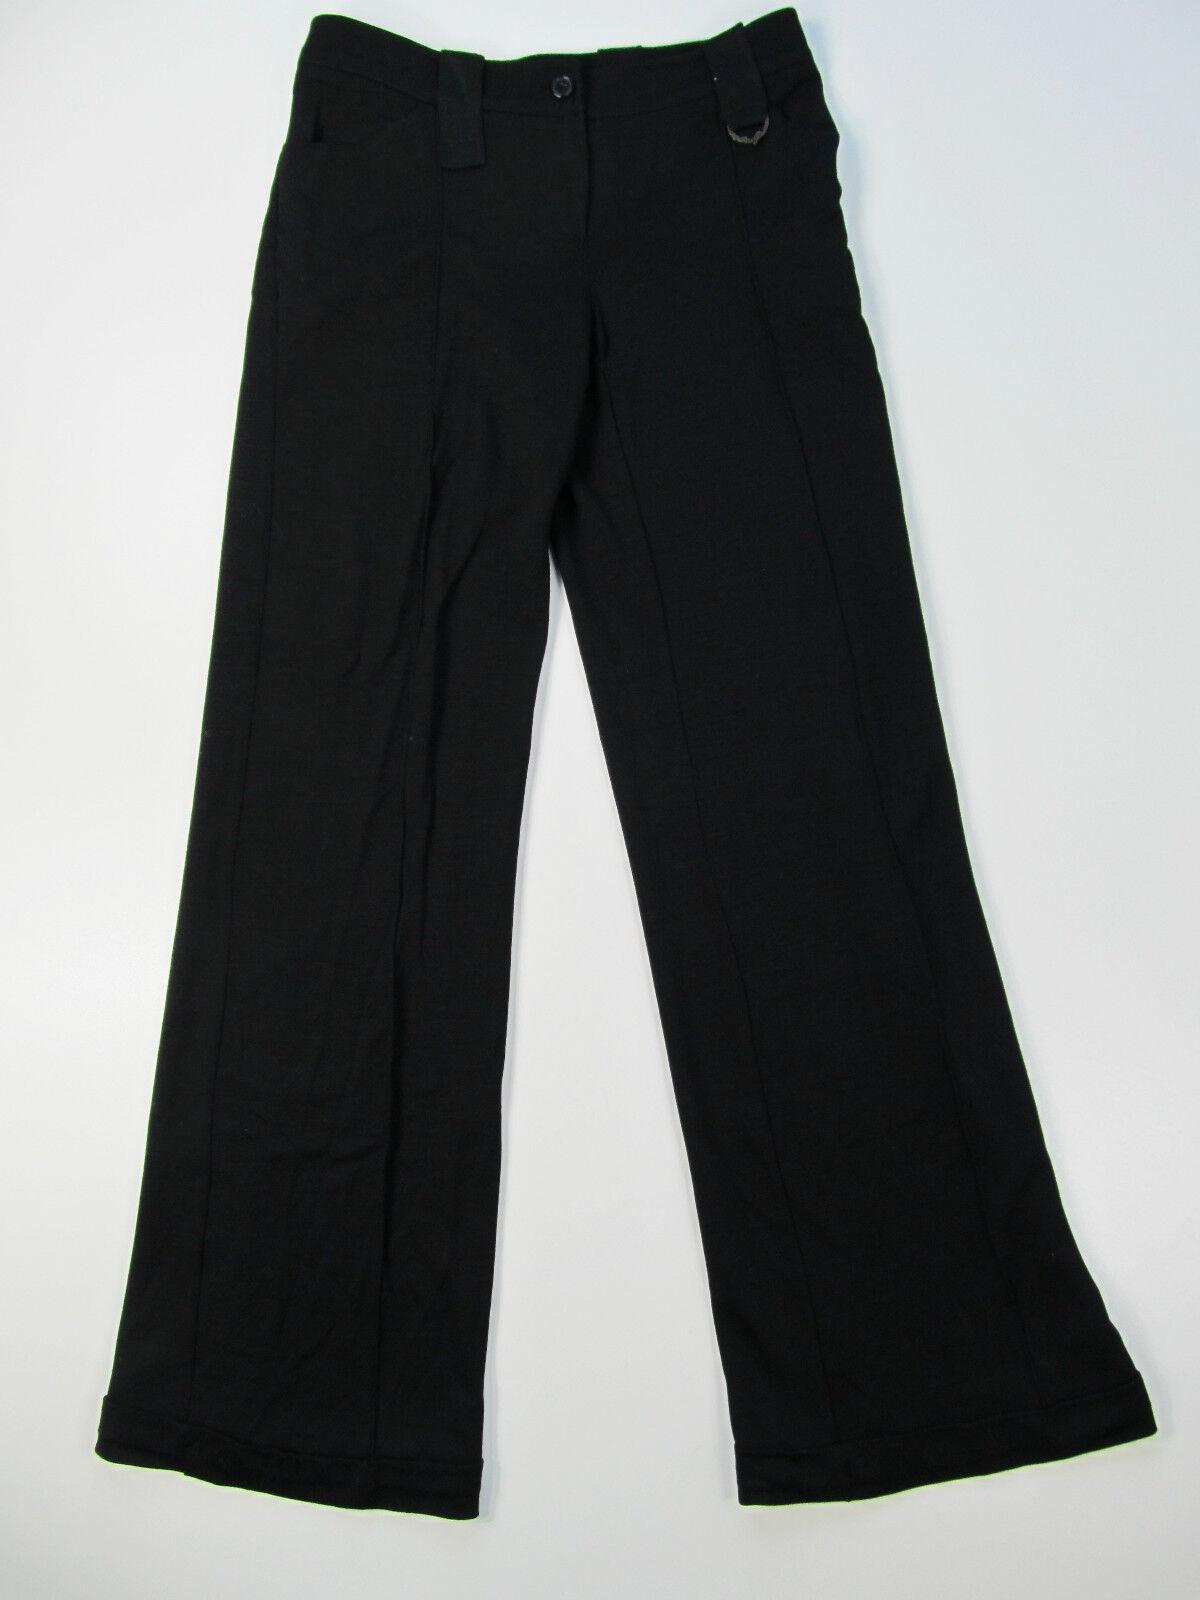 Liu.Jo Hose Pantalon black Broek  Neu  IT 42  DE 36